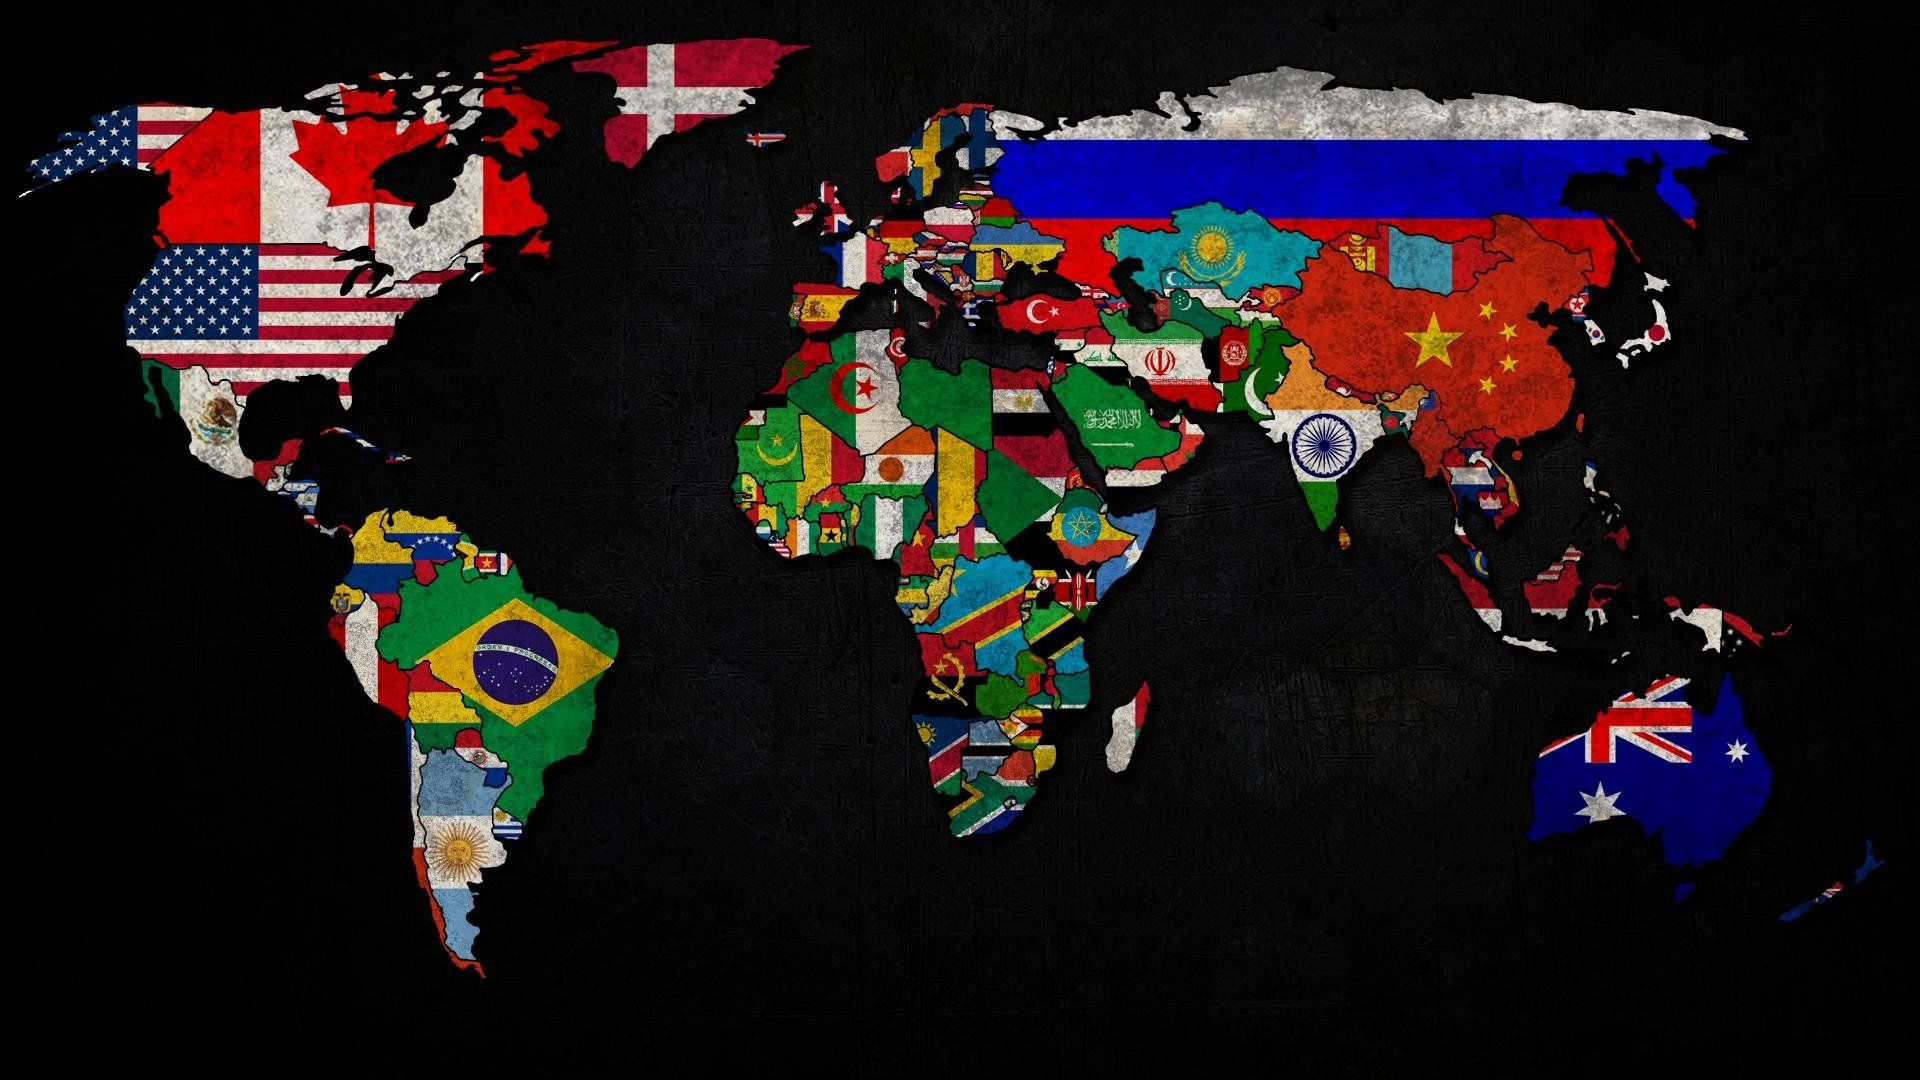 World Map laptop background wallpaper